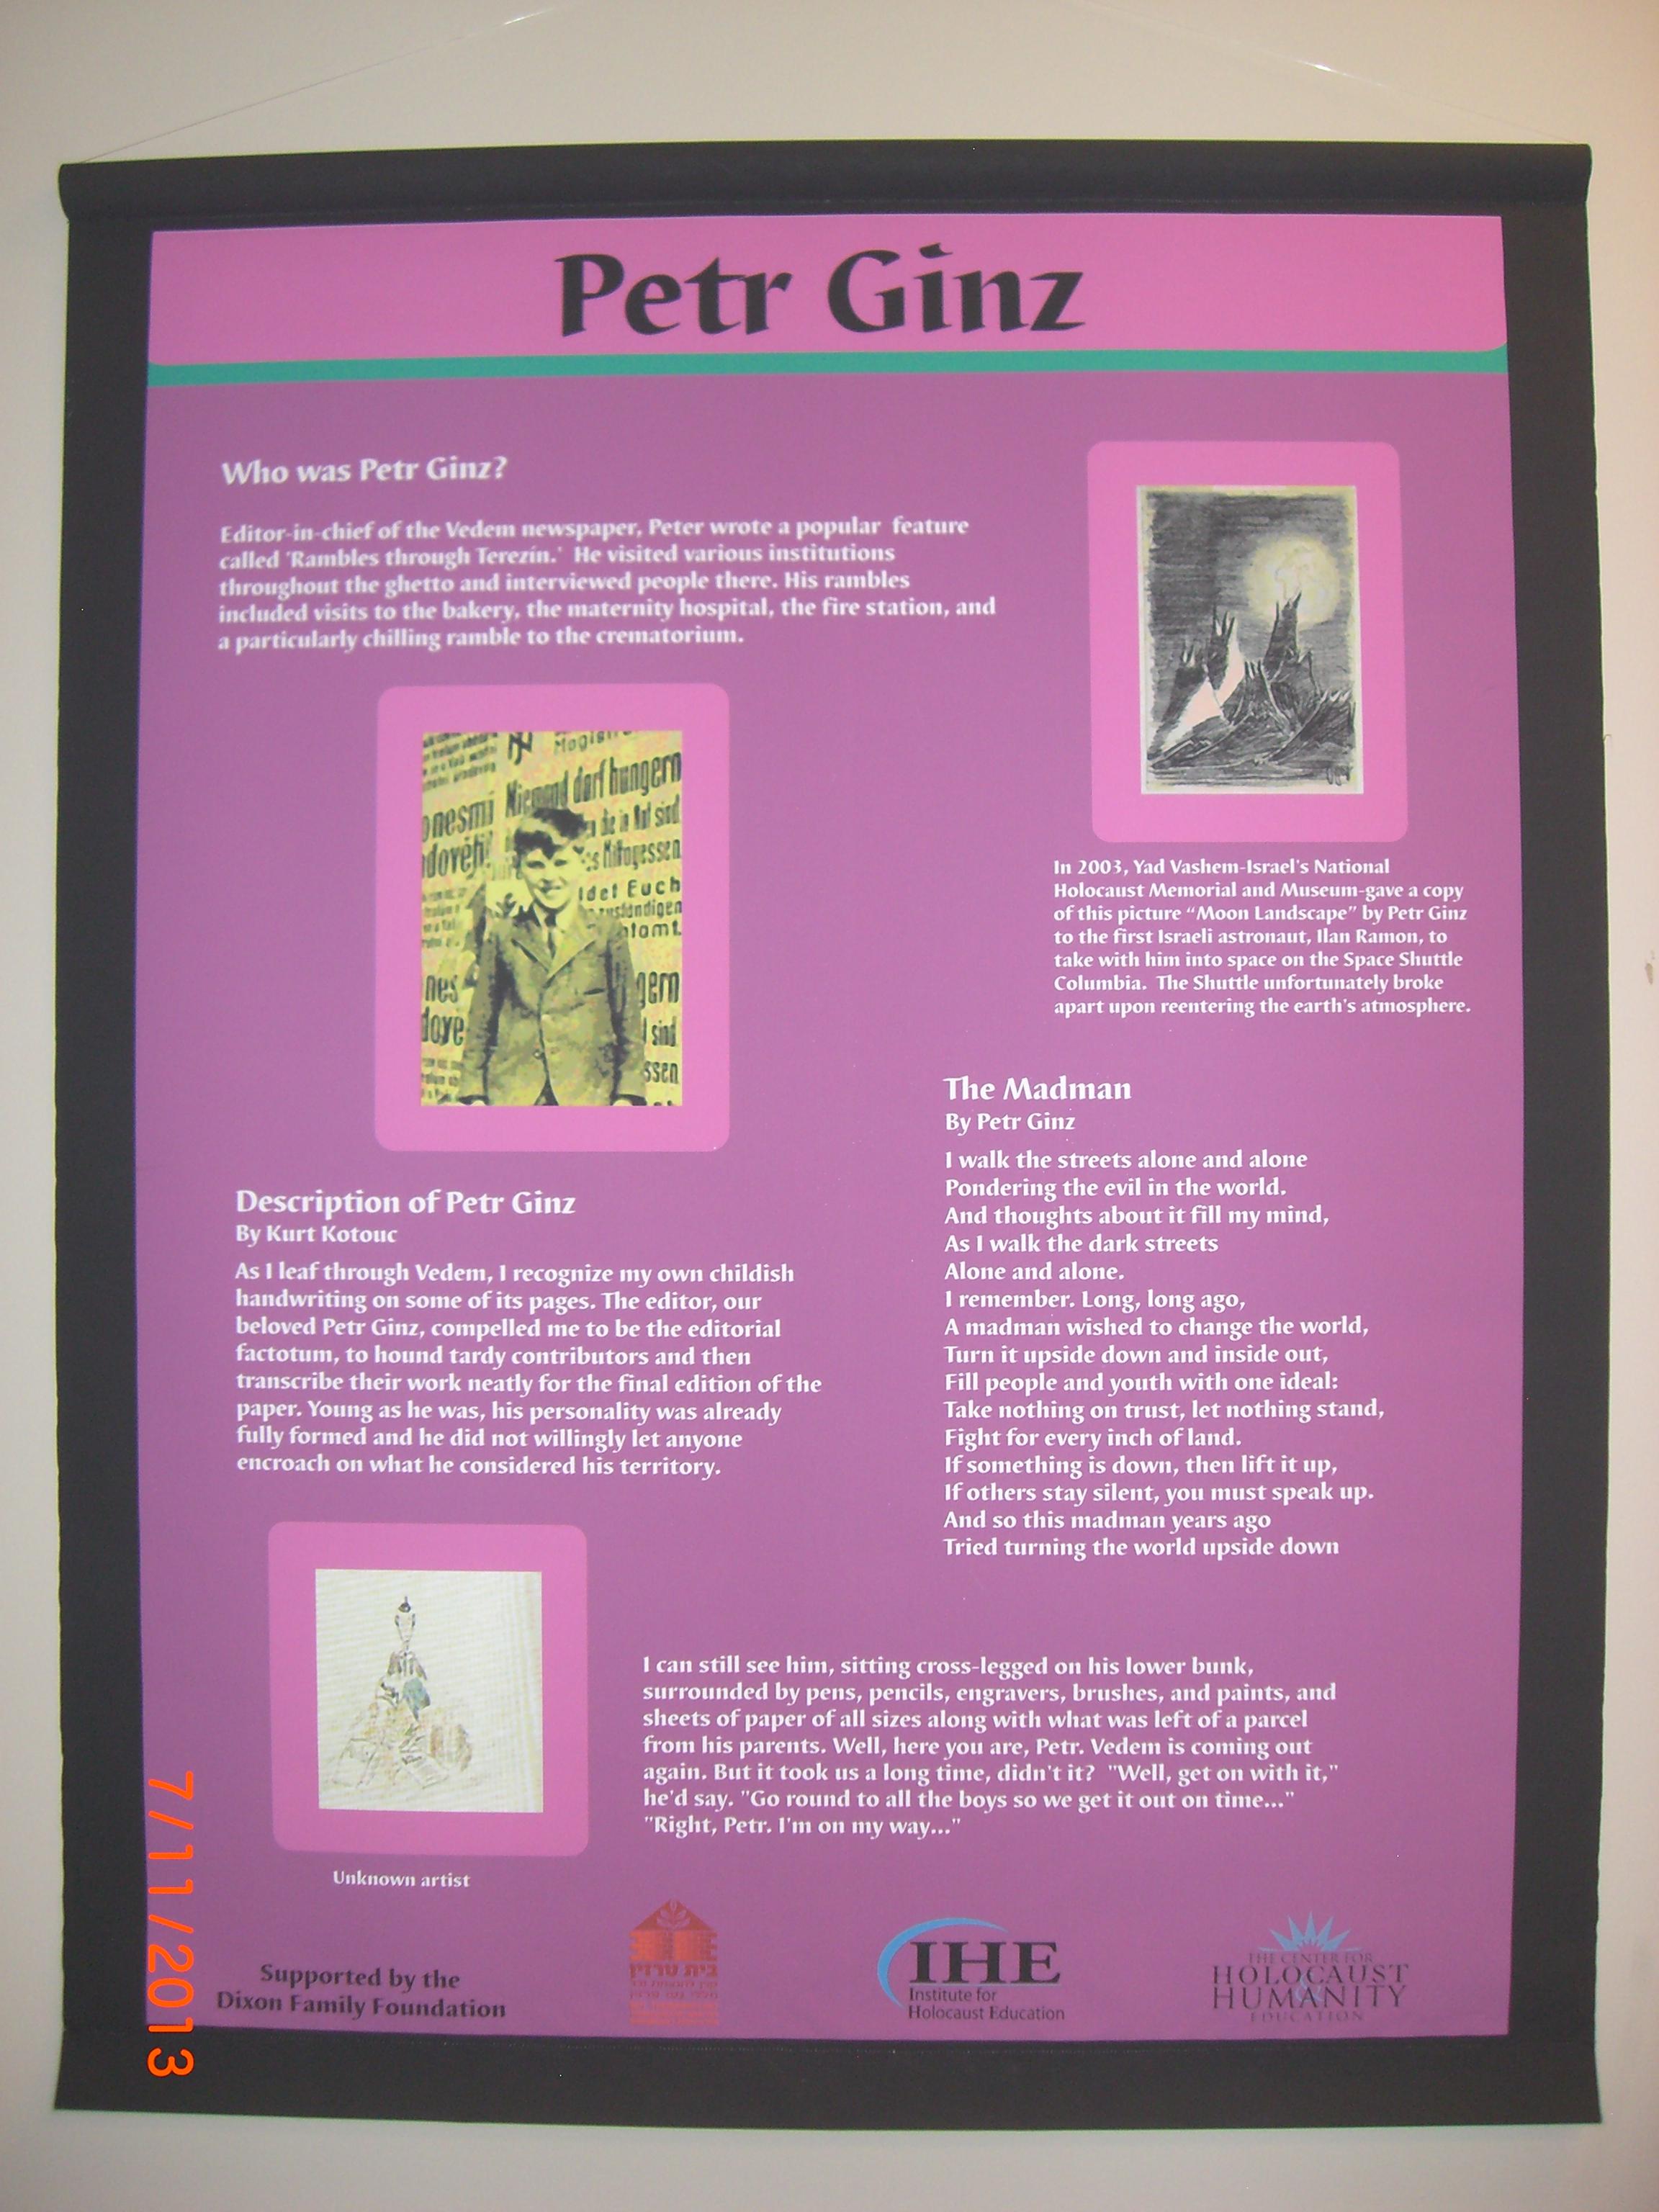 Peter Ginz